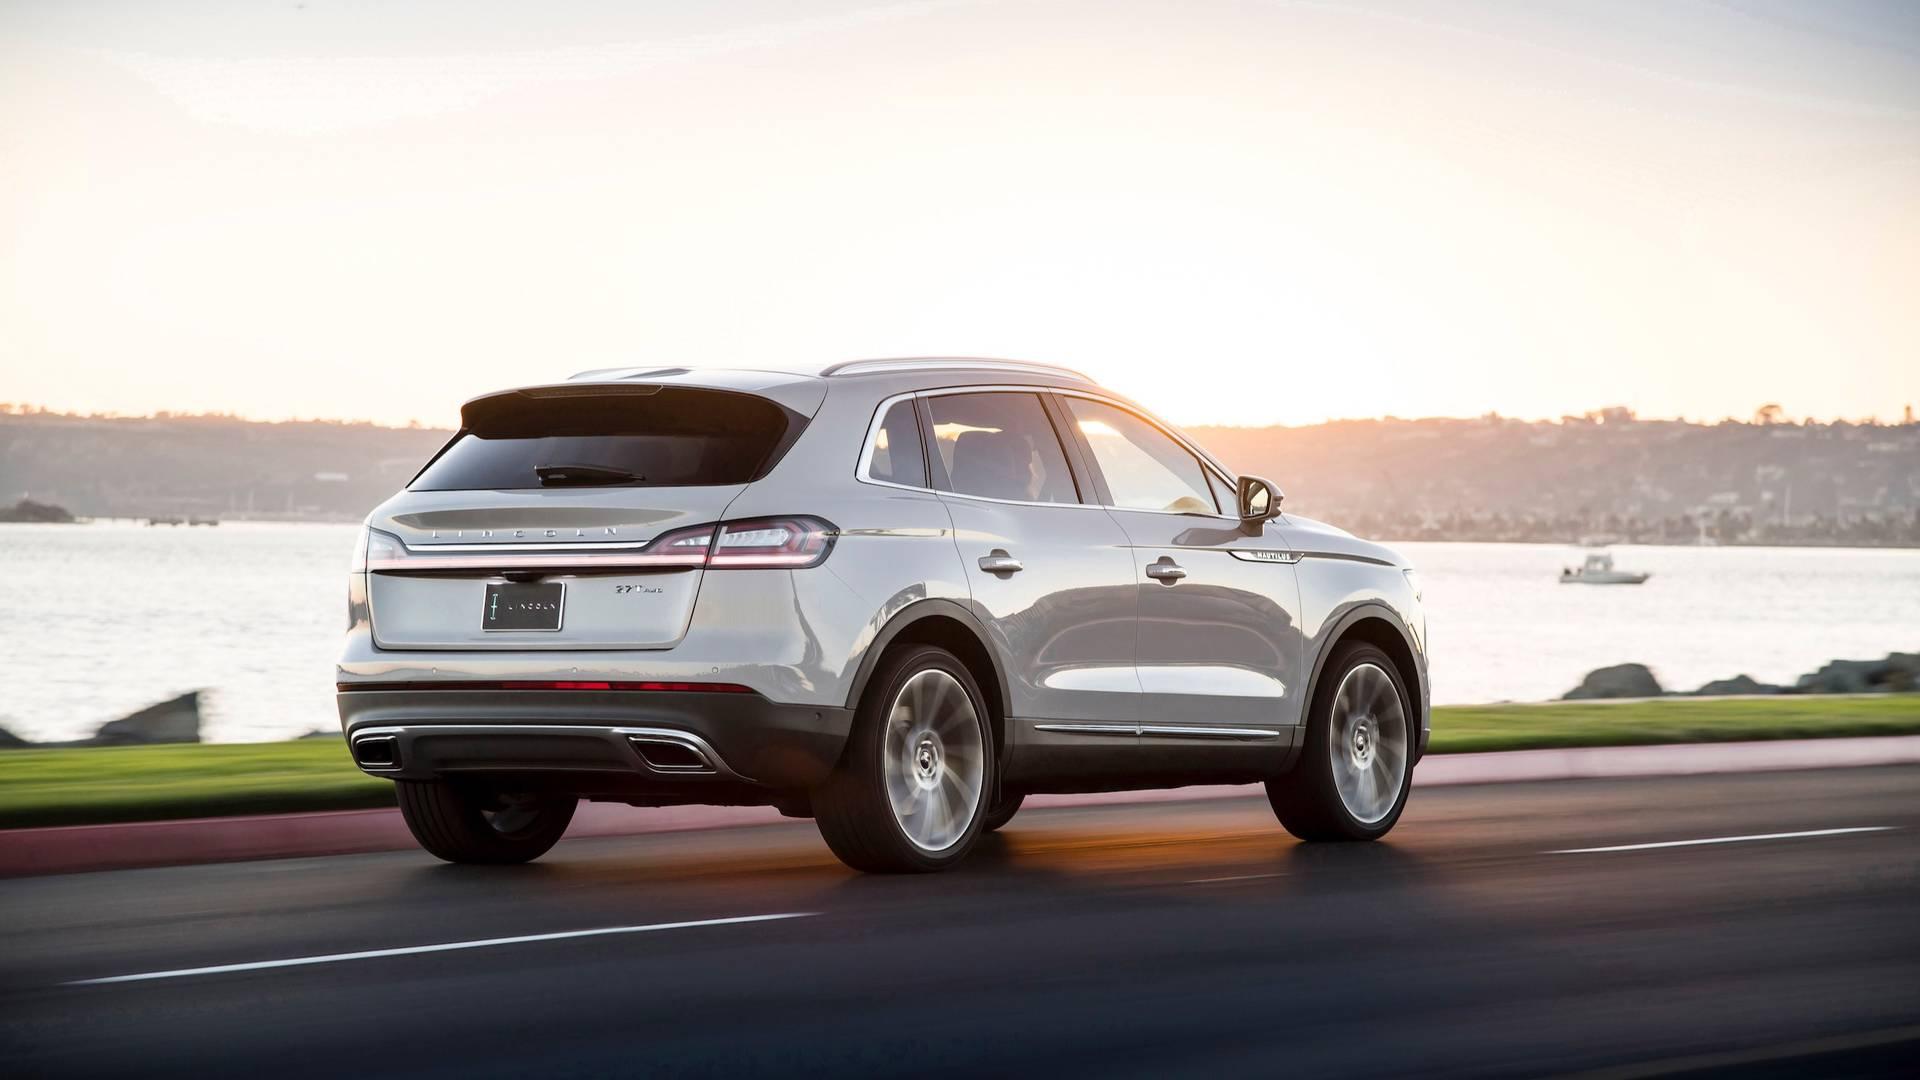 2020 Lincoln Nautilus: Design, Performance, Price >> 2019 Lincoln Nautilus Picks Up Where Mkx Left Off